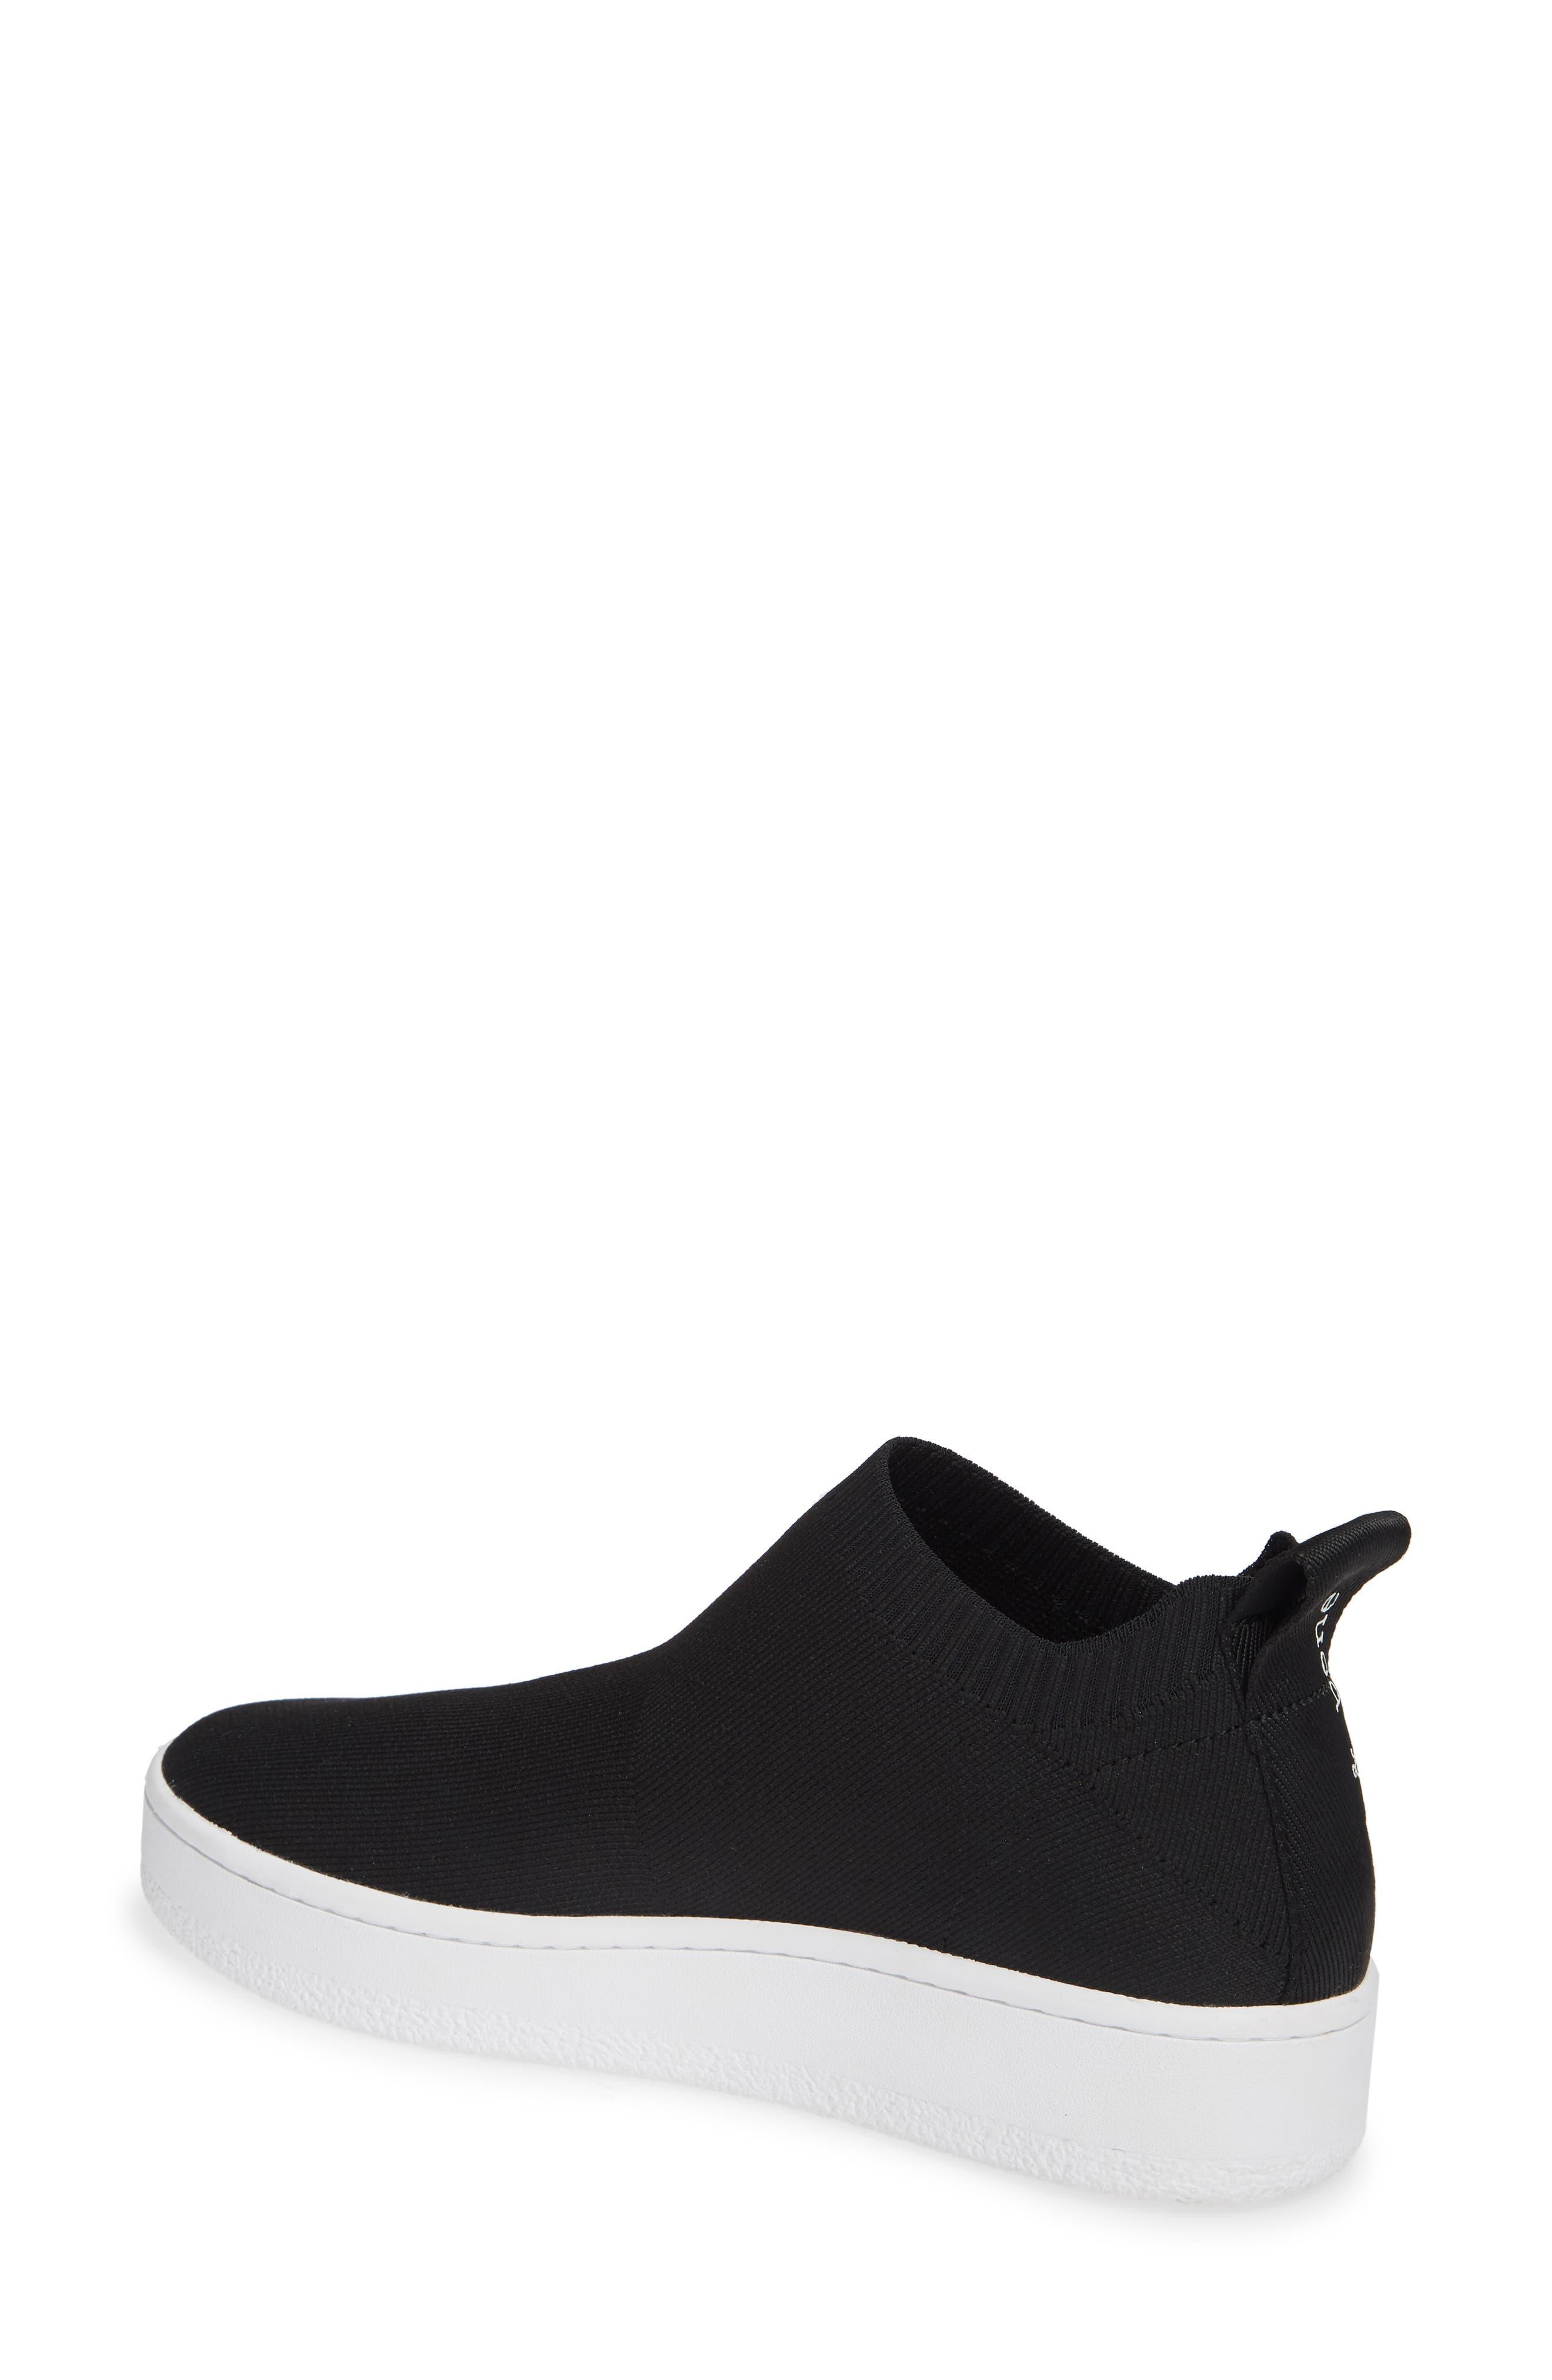 Orion Platform Sneaker,                             Alternate thumbnail 2, color,                             001